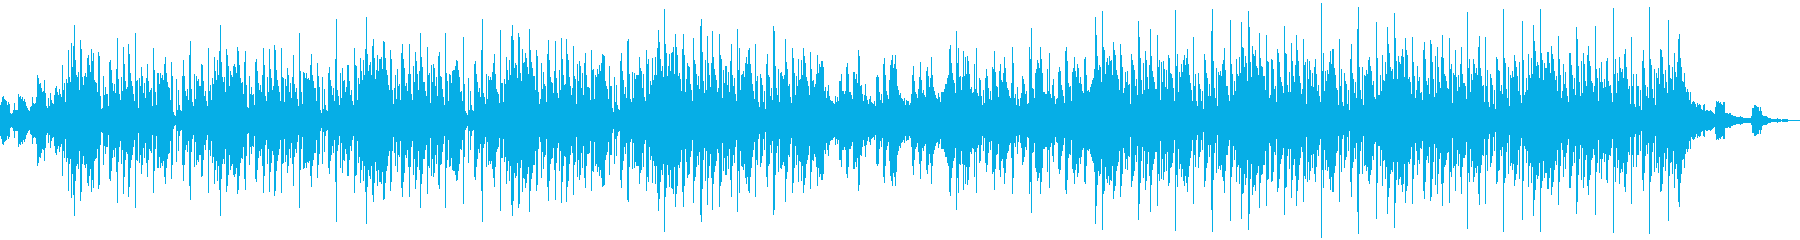 Oriental musicの再生済みの波形